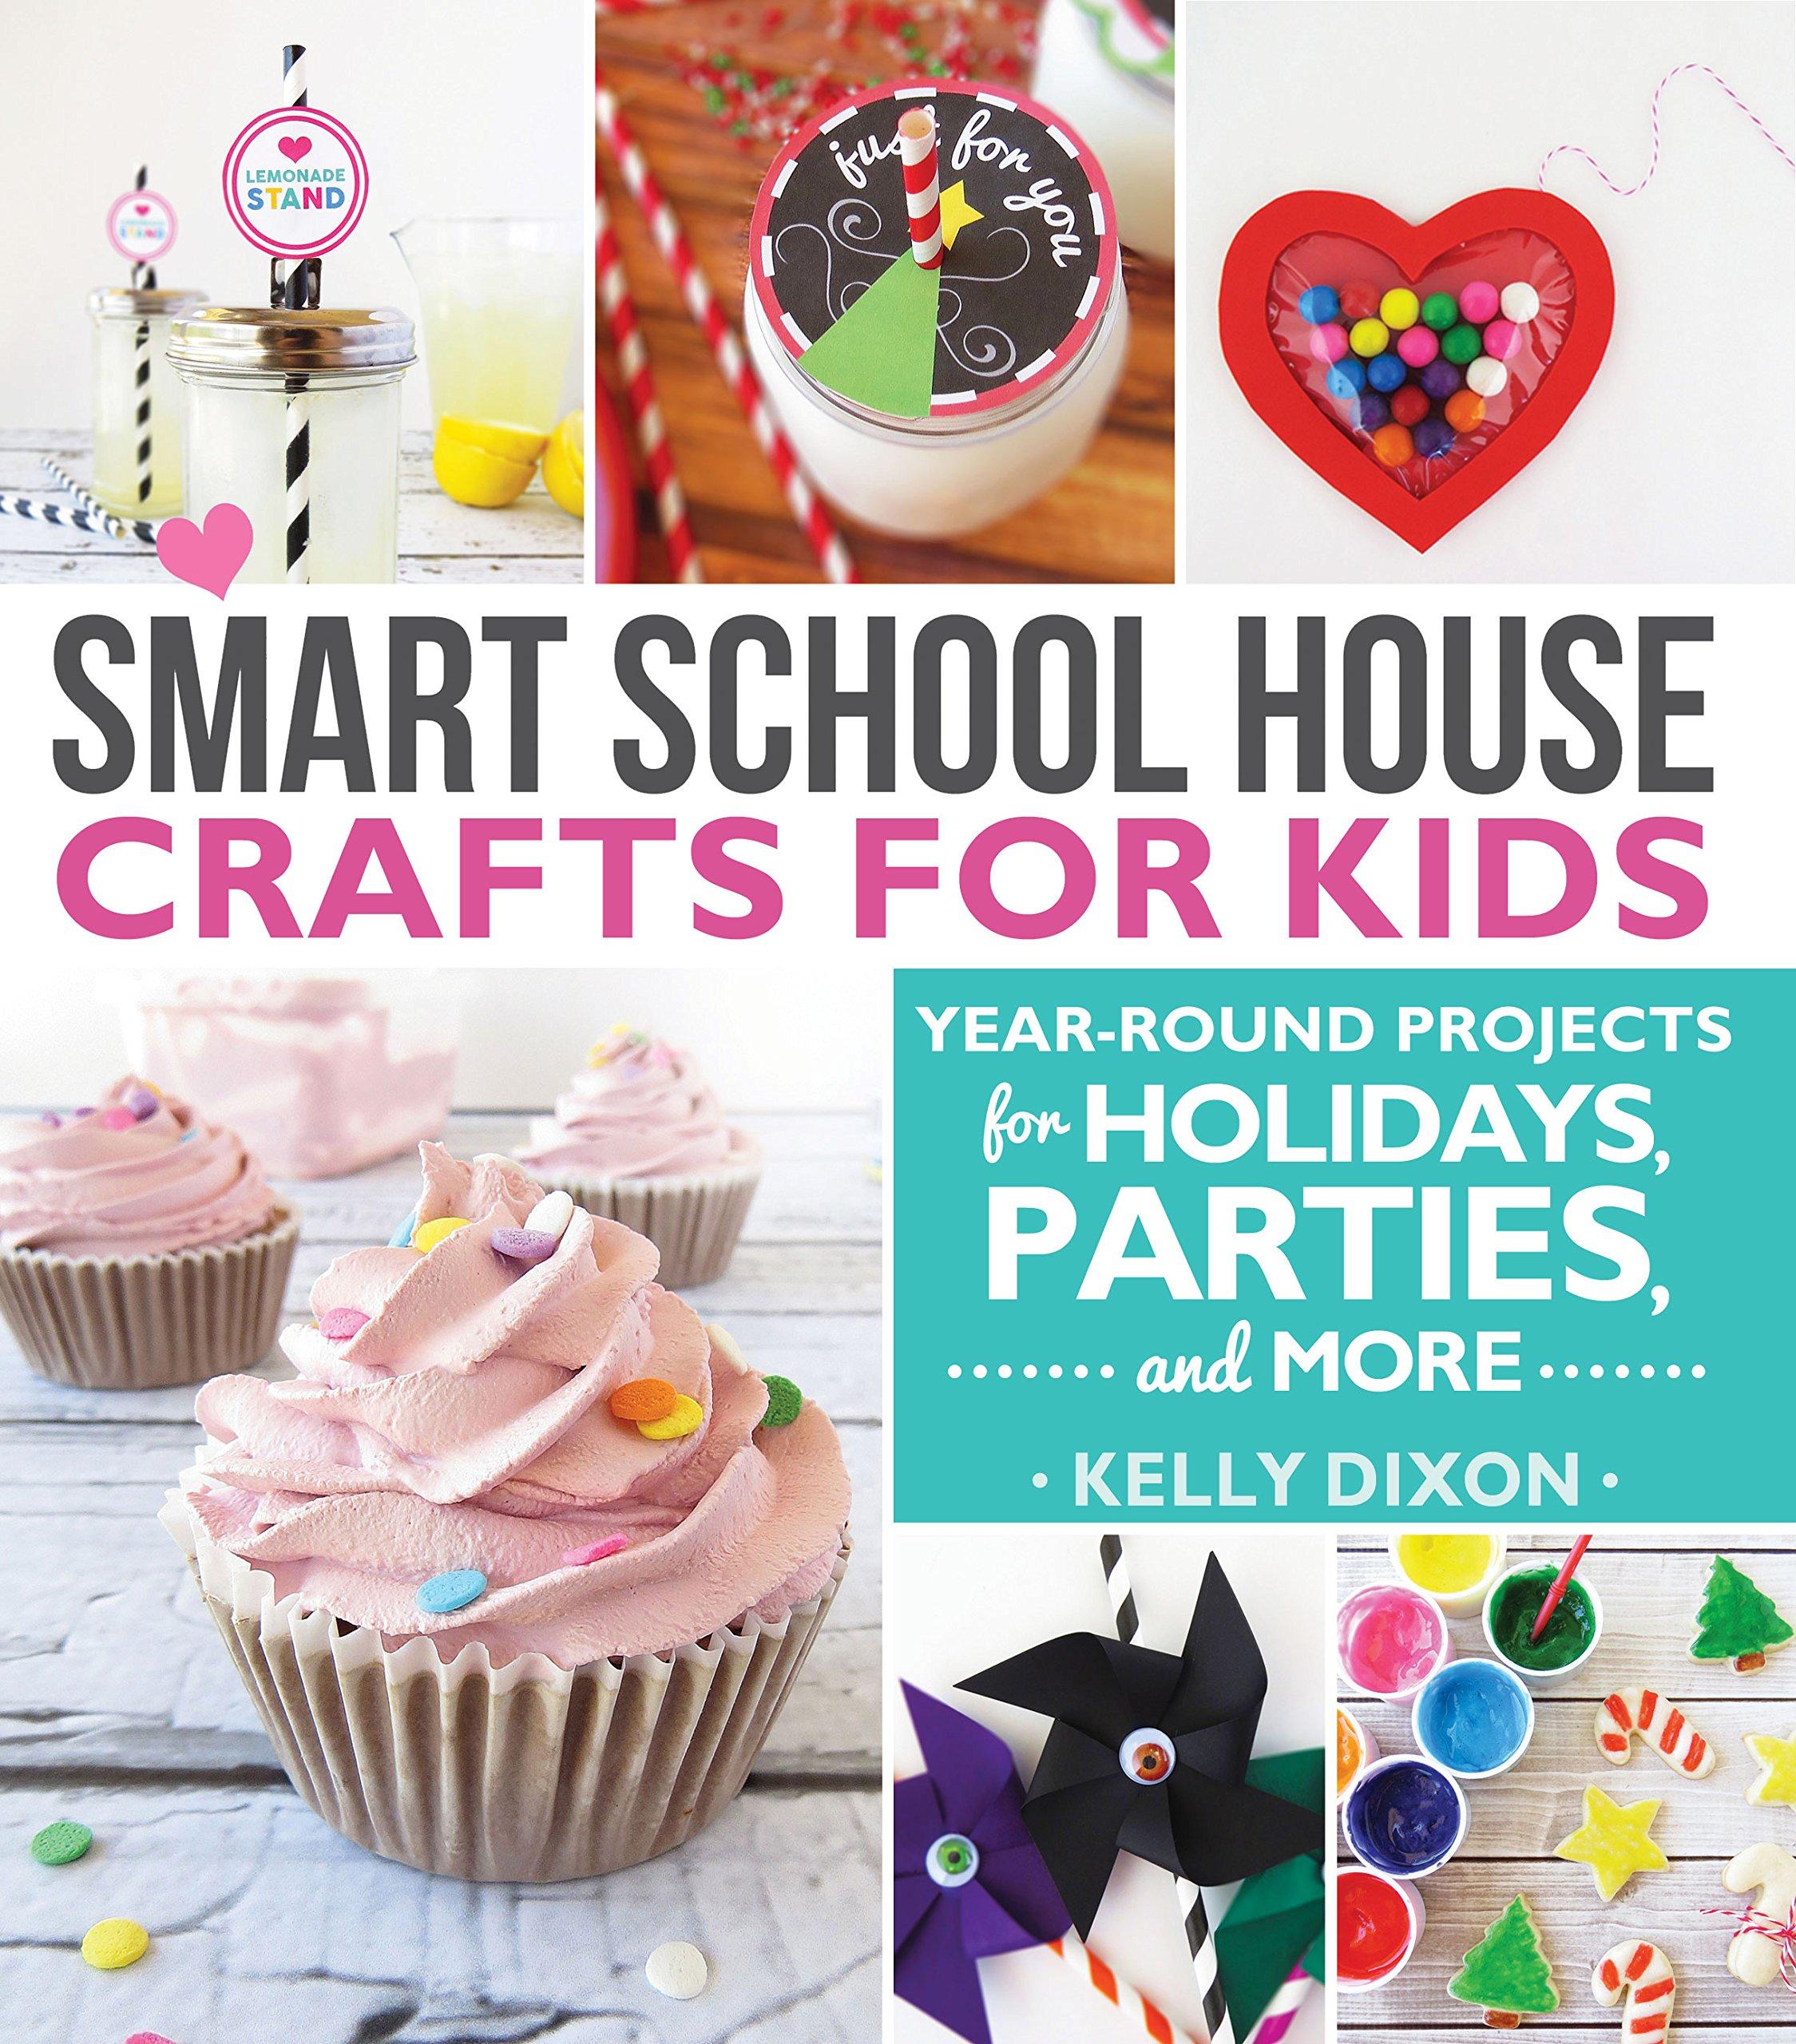 House Craft Ideas For Kids Part - 44: Smart School House Crafts For Kids: Year-round Projects For Holidays,  Parties, U0026 More: Kelly Dixon: 9781462115426: Amazon.com: Books